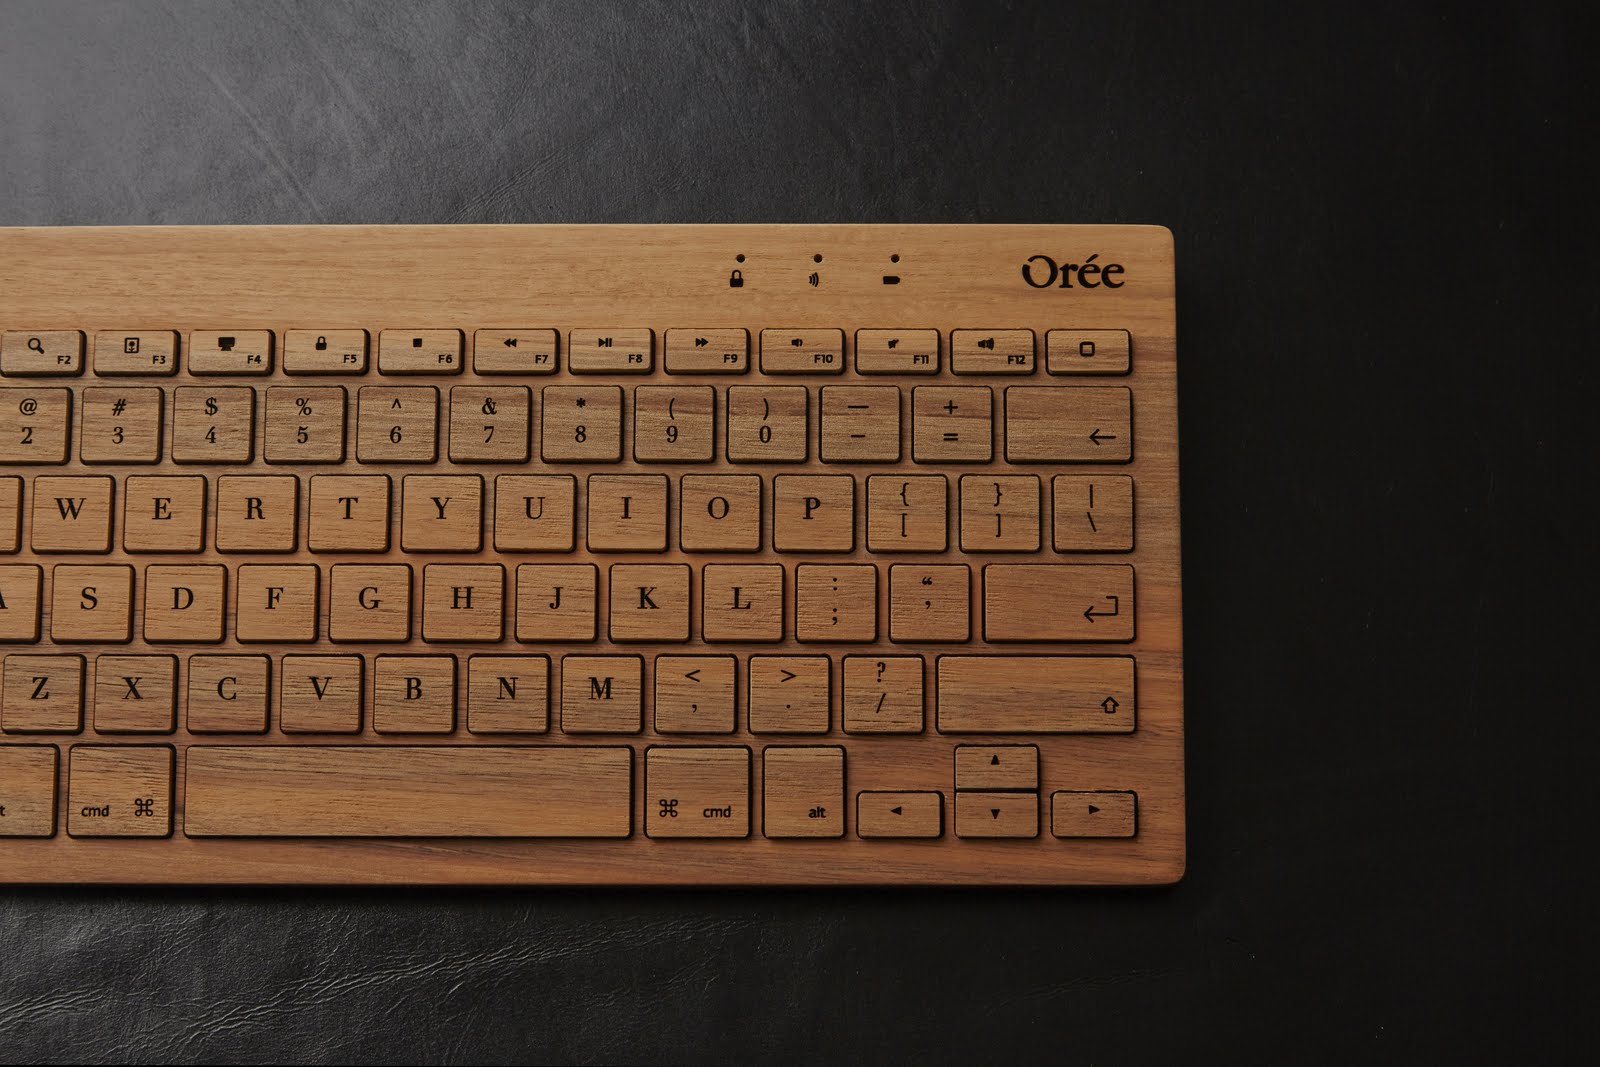 Oreeキーボードのレーザー彫刻 - 完成写真2